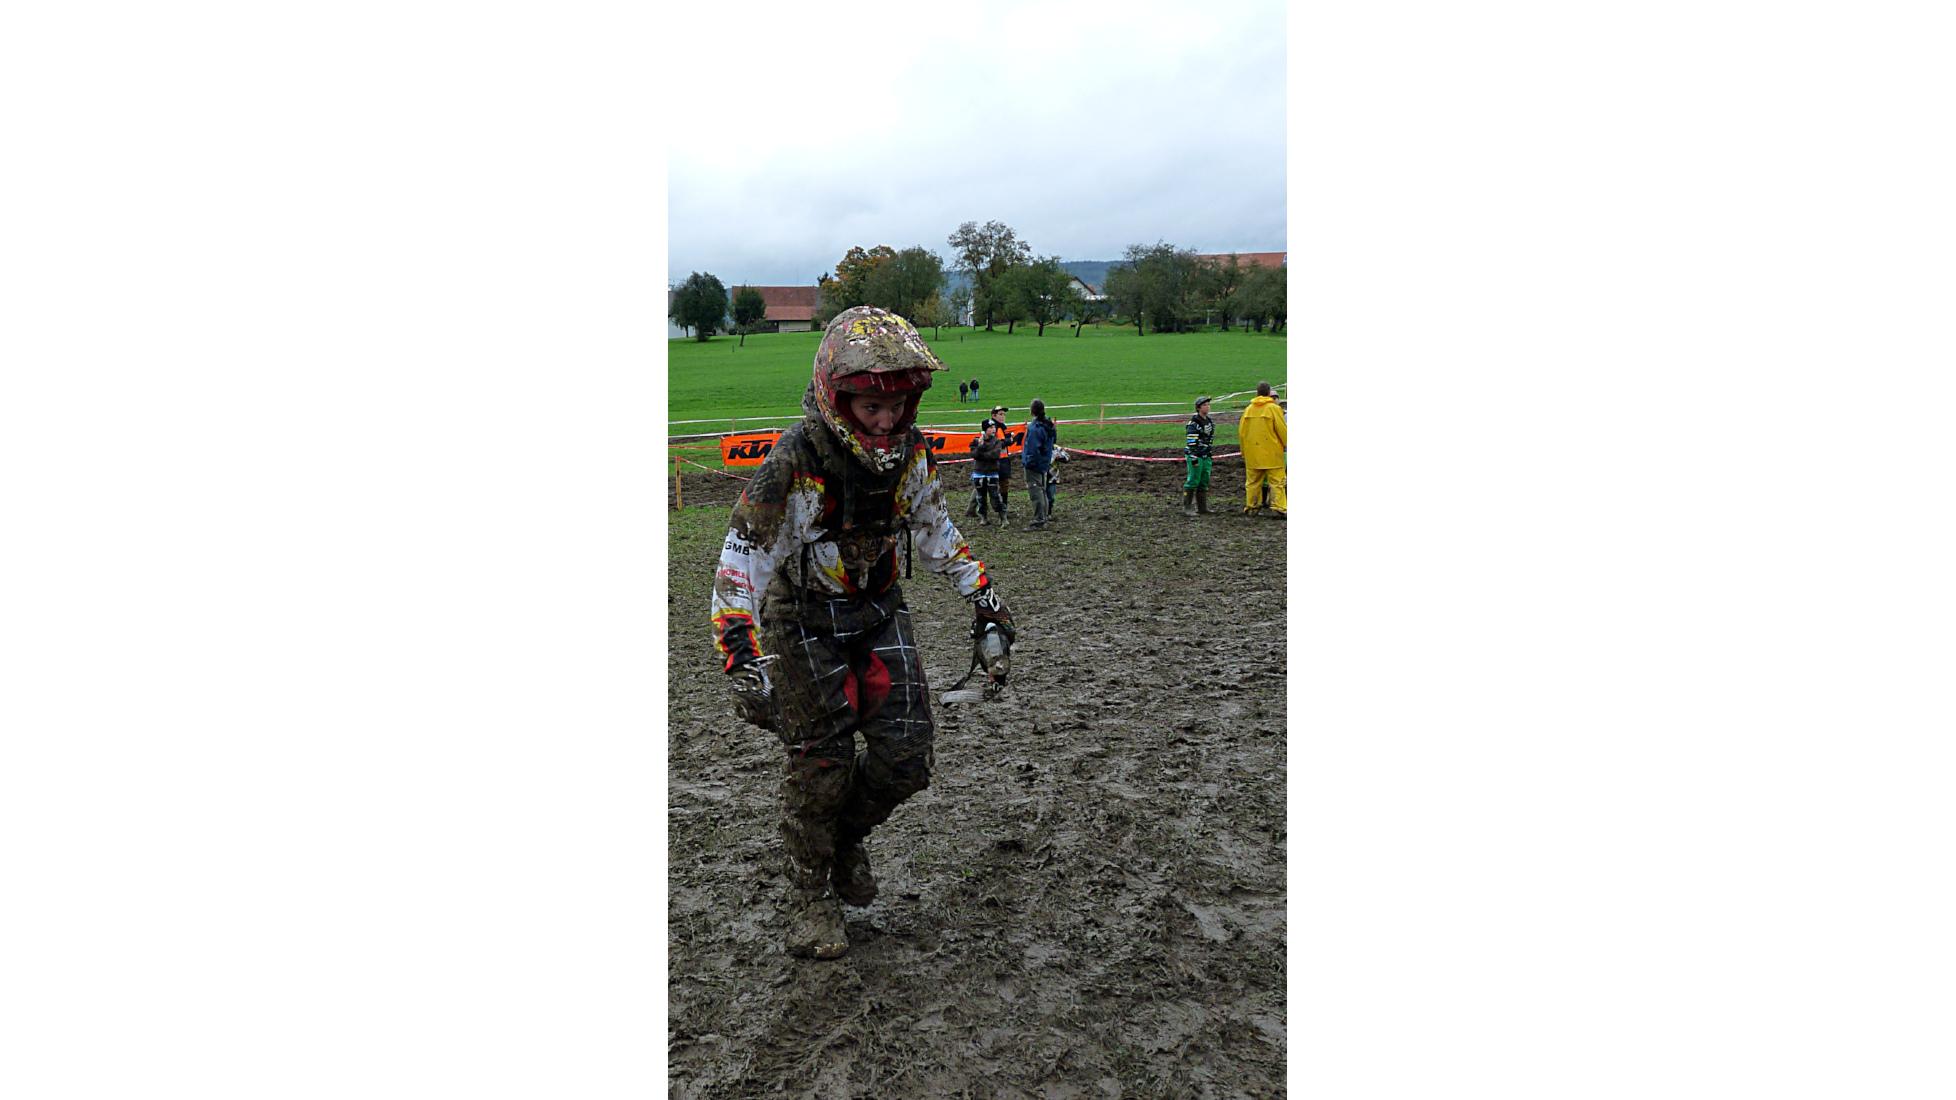 Header Besonderes Rennen Teil 2 - Schlammrennen - Nina - Motocross-Adventskalender - miradlo Versanddepot